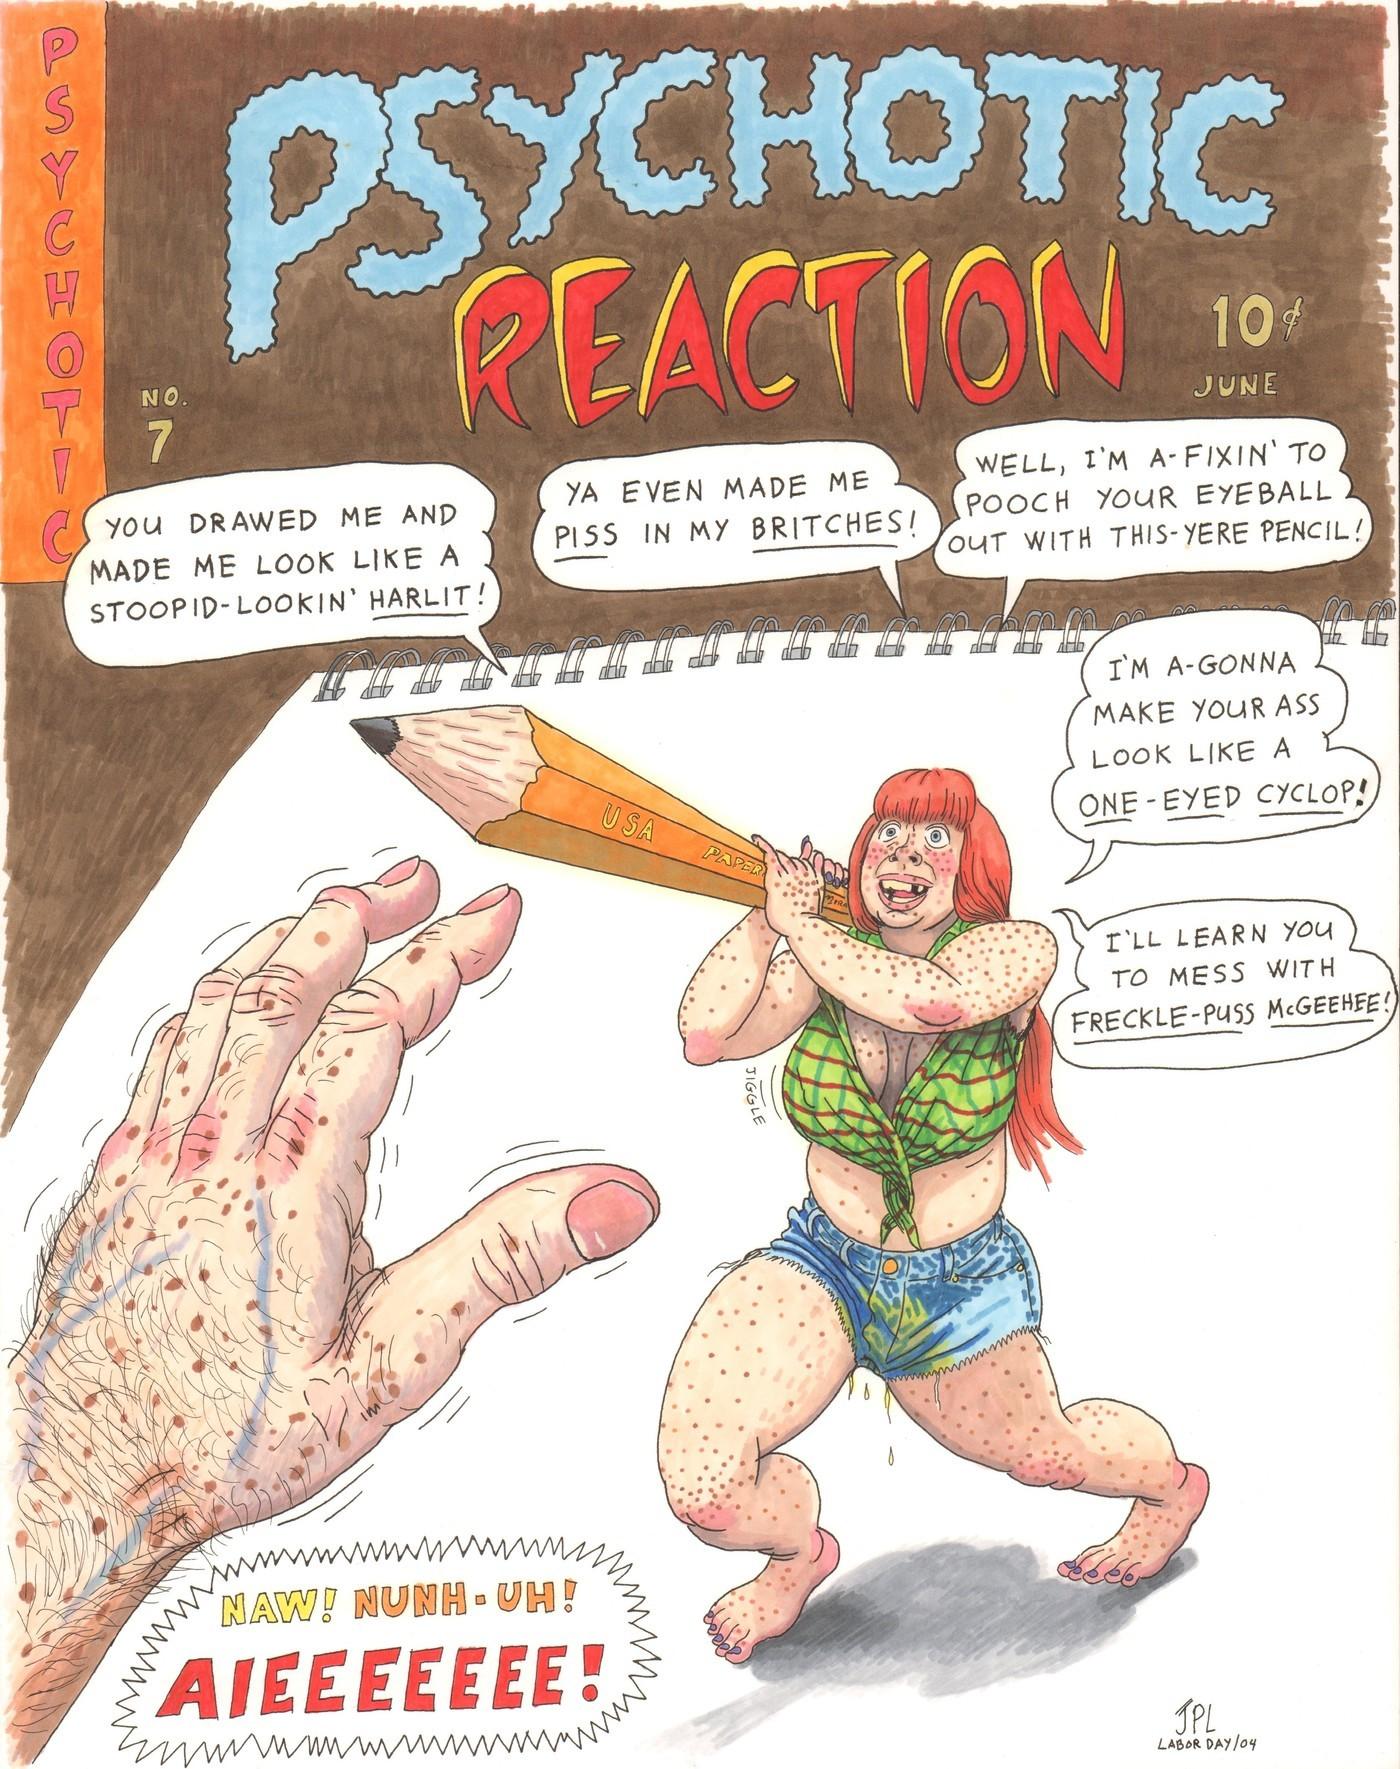 Psychotic Reaction - Every Little Bitz